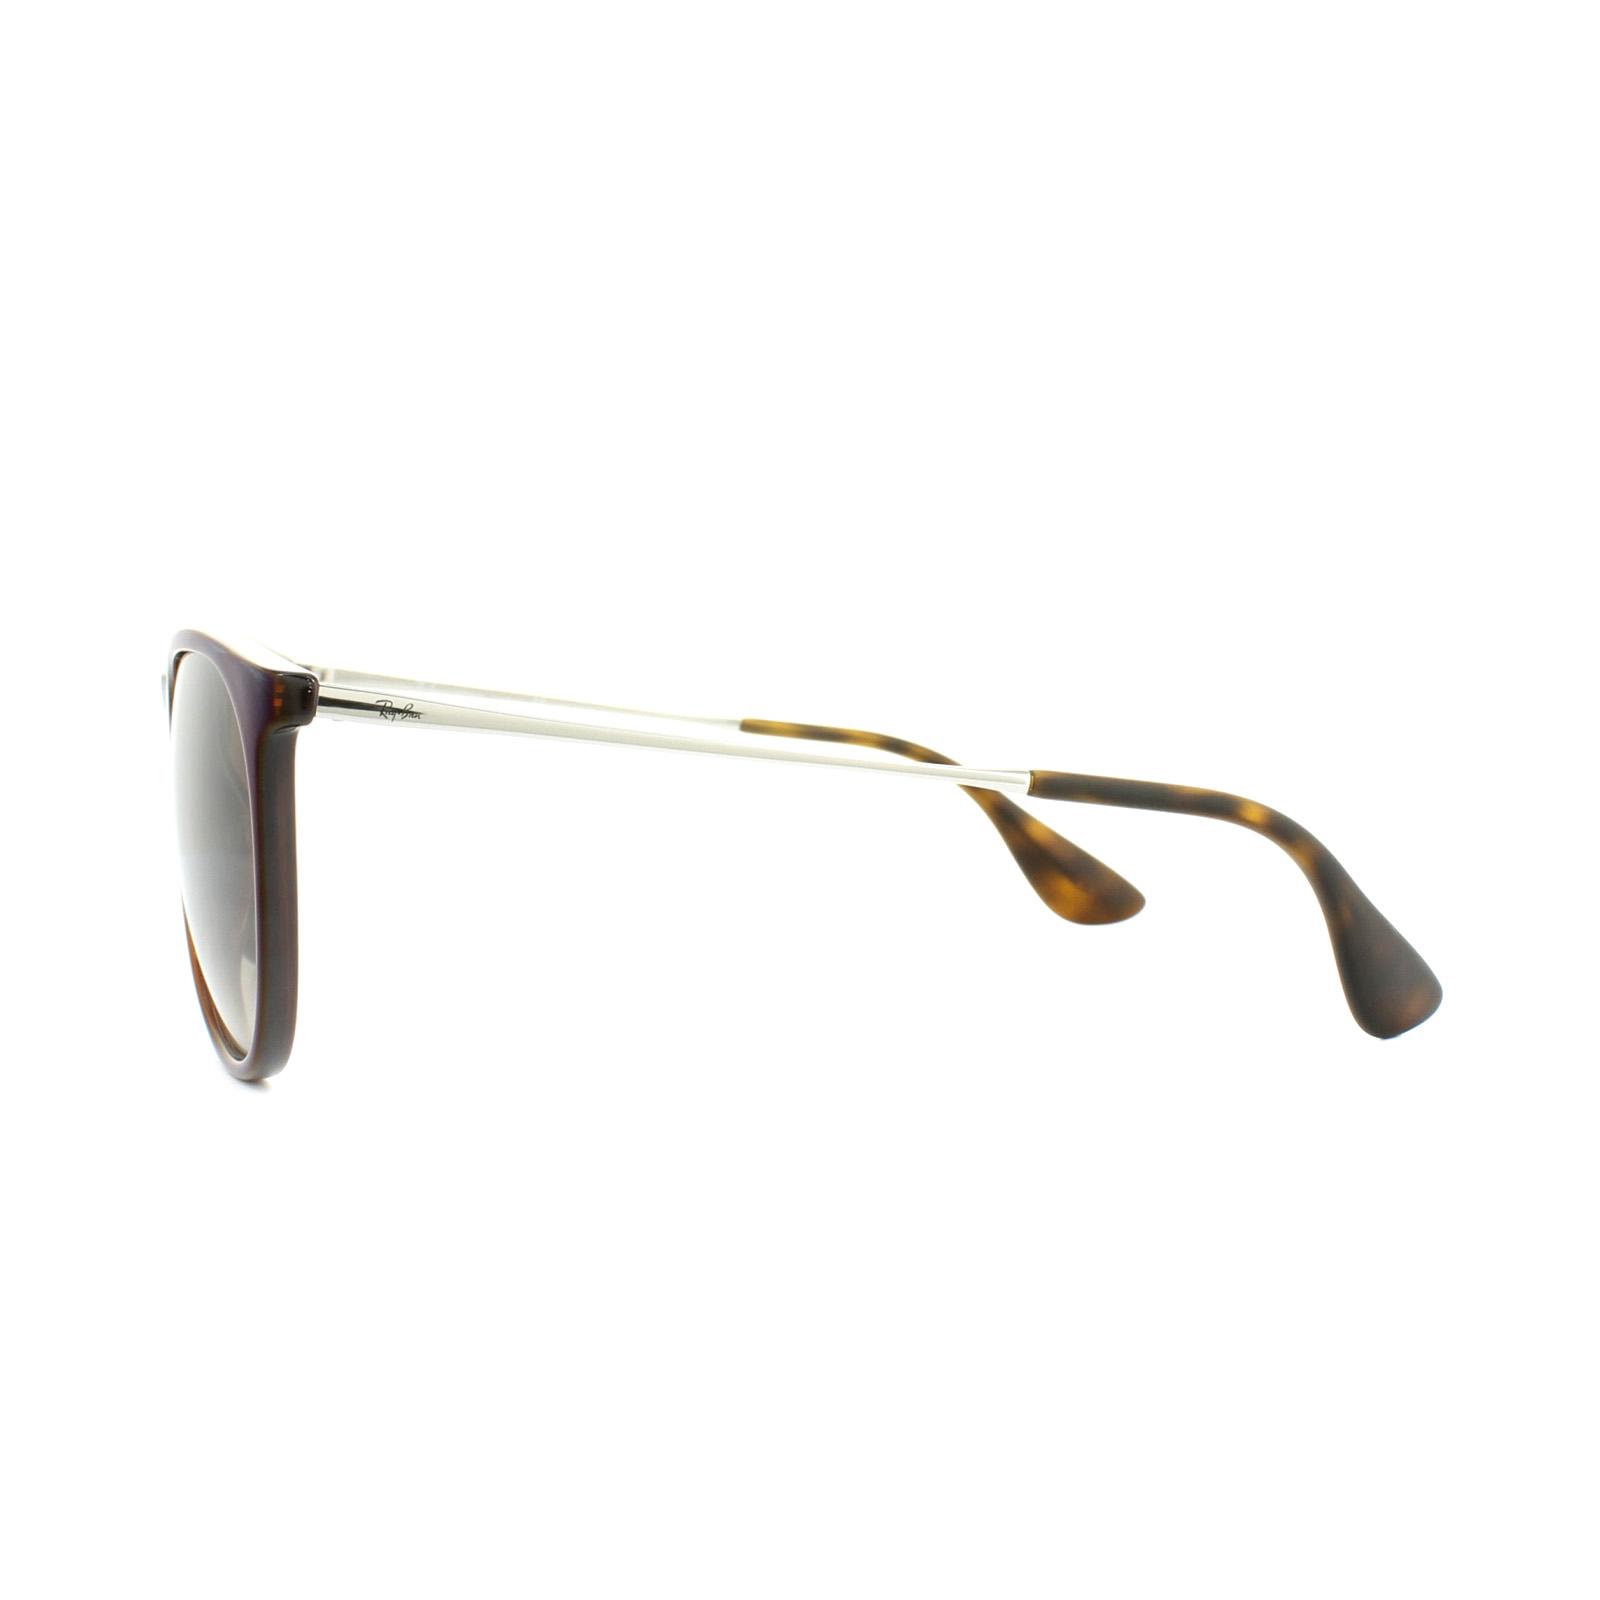 b9ac13778f Sentinel Ray-Ban Sunglasses Erika 4171 631513 Brown Blue Brown Gradient